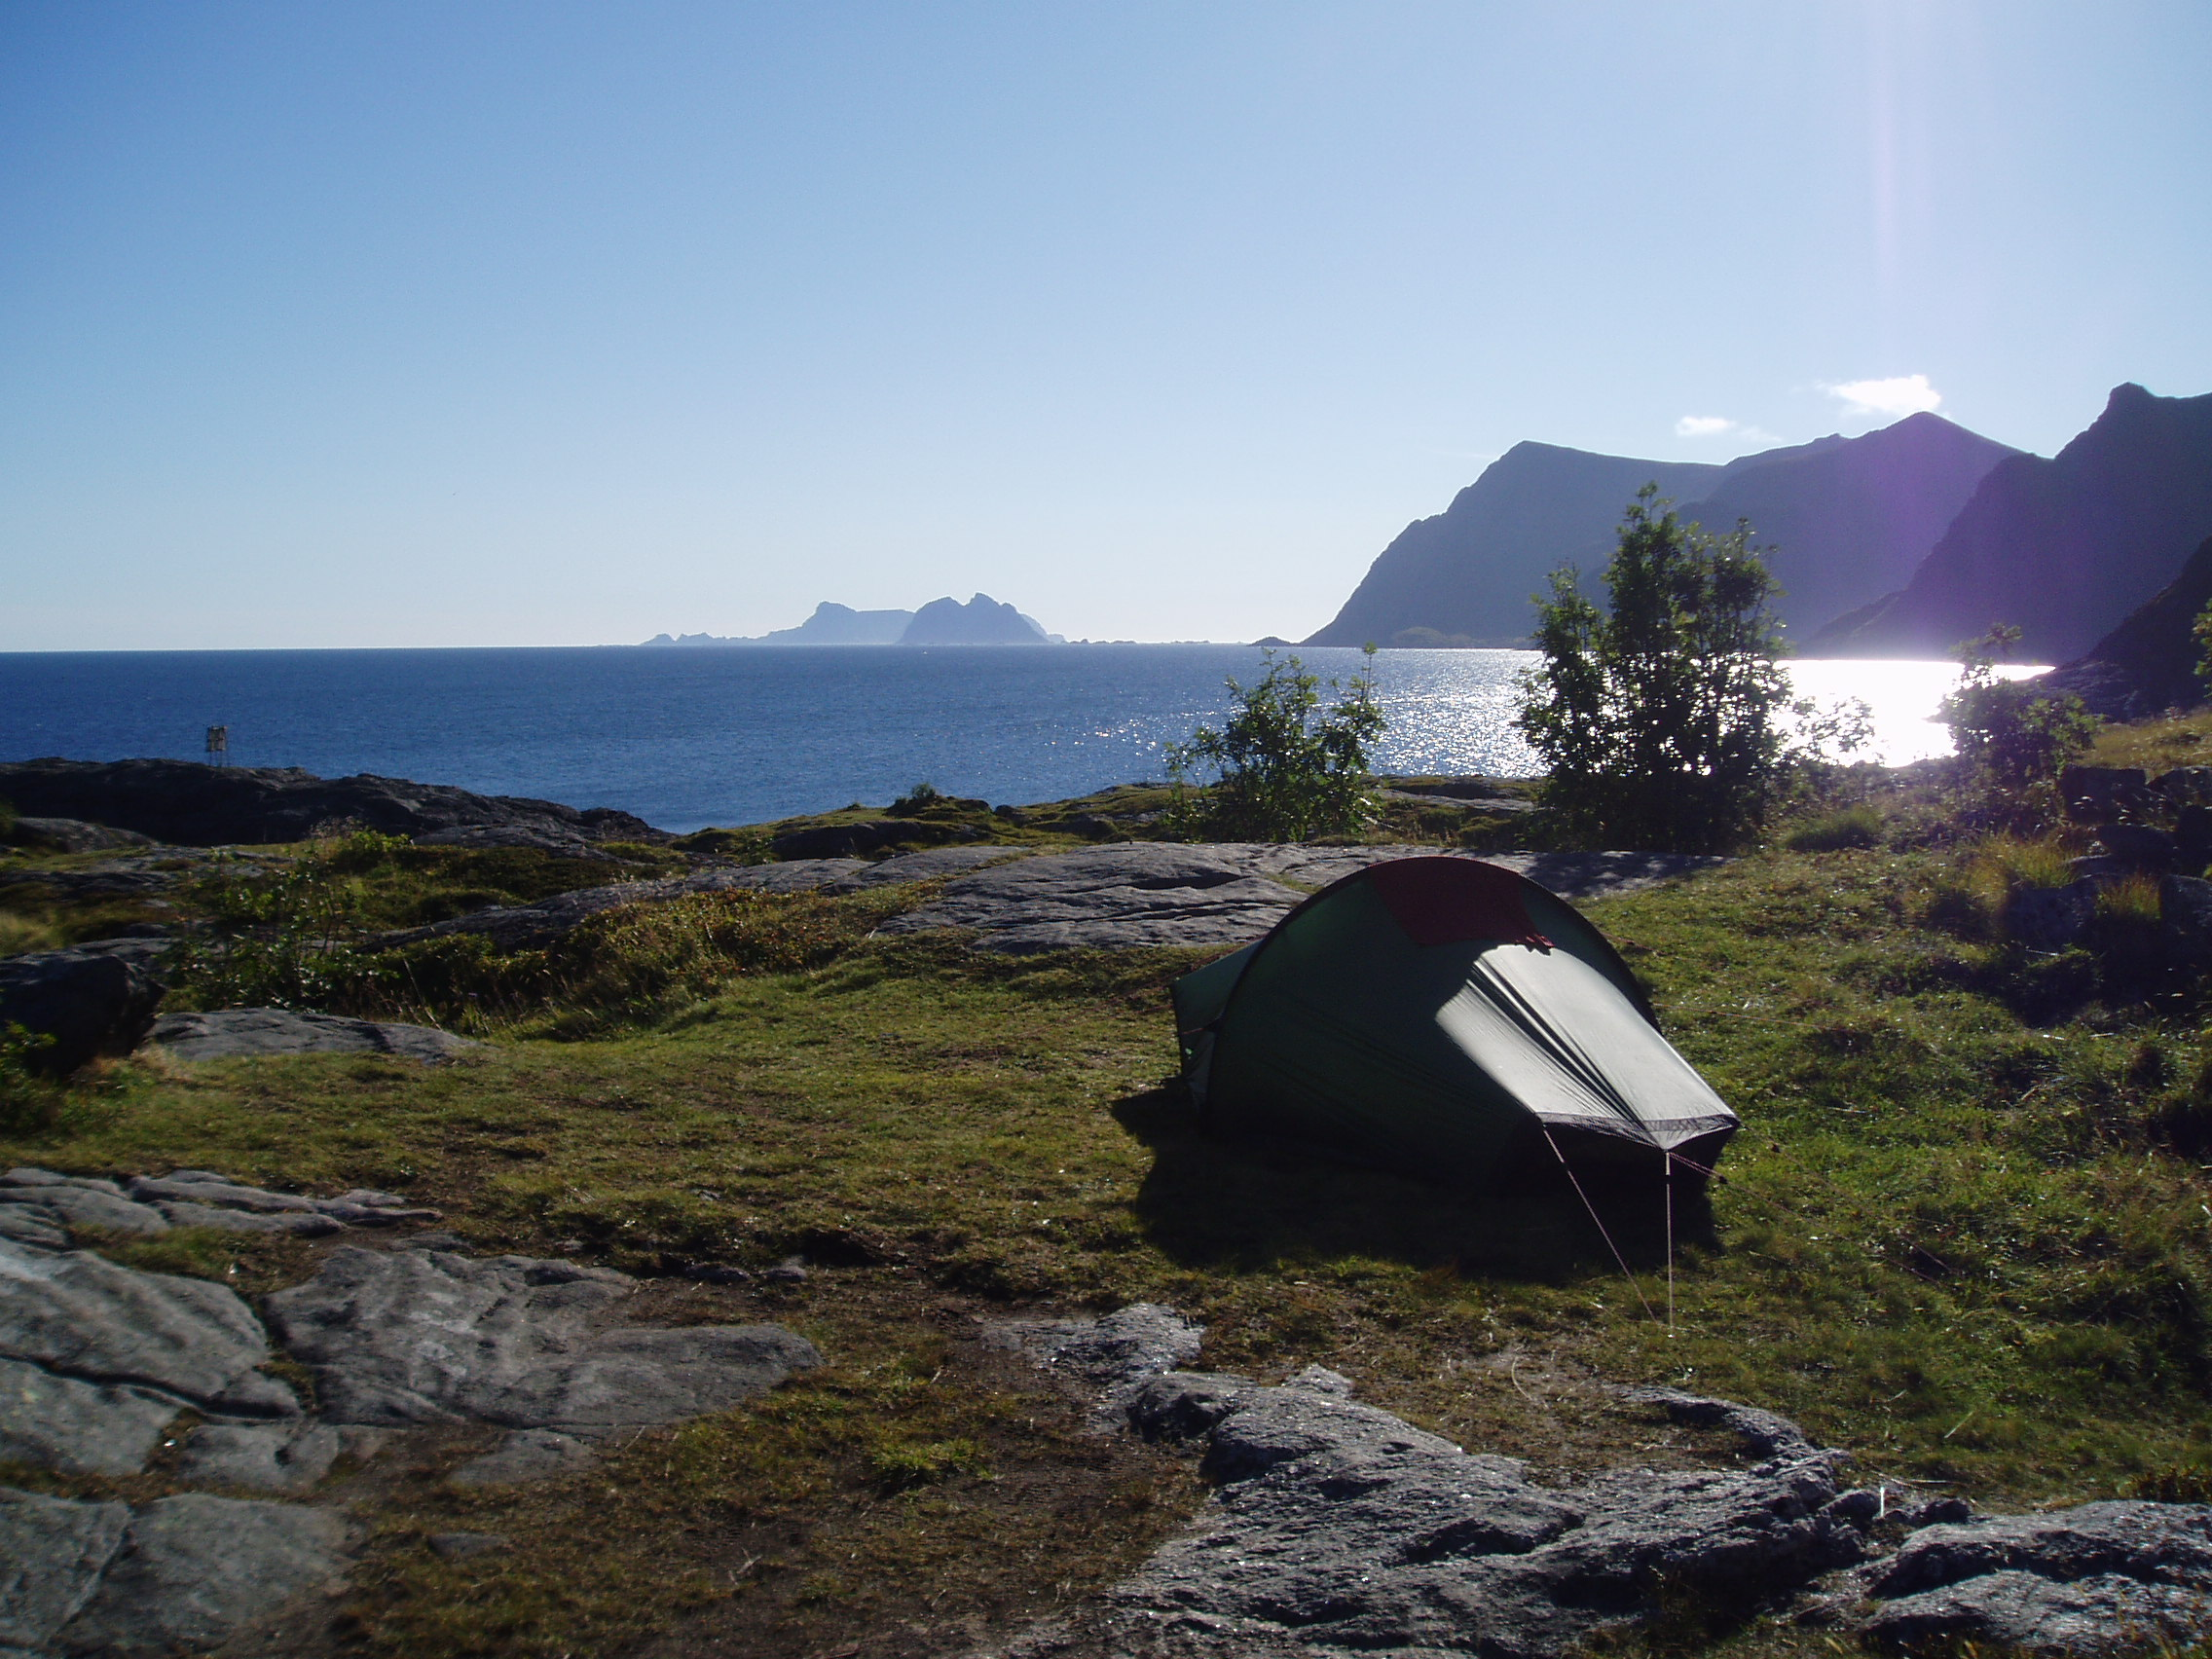 Creative Car Wallpapers File Camping At 197 In The Lofoten Islands Norway Jpg